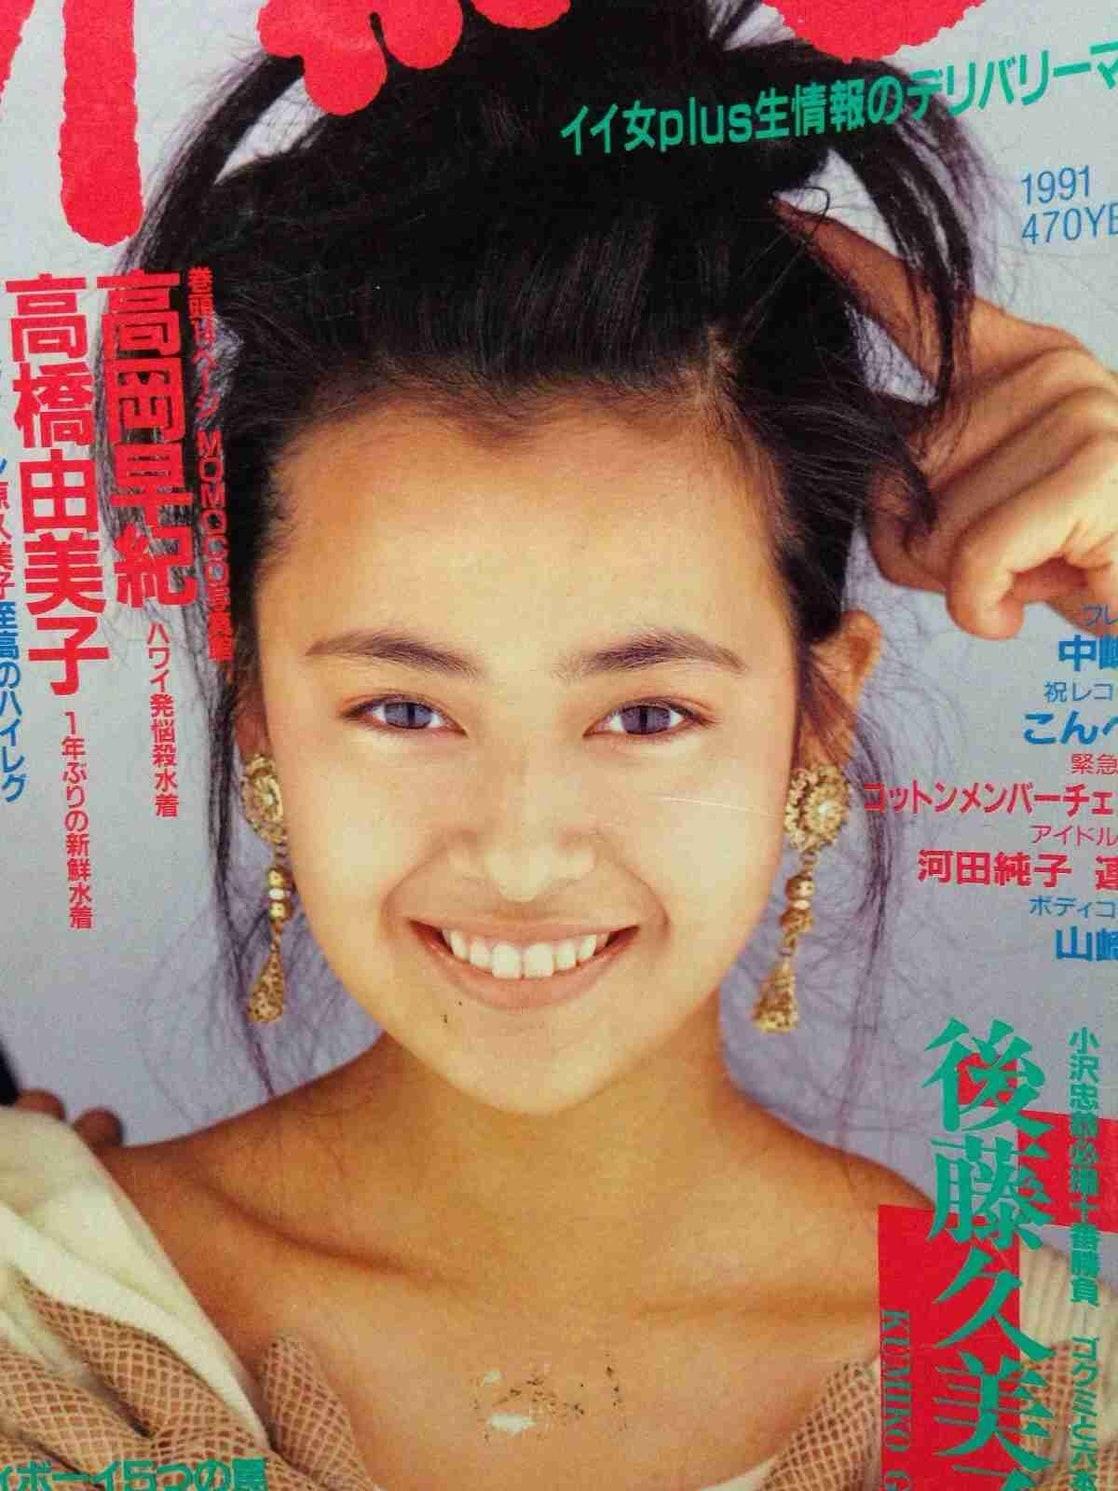 Kumiko Goto nude (53 foto and video), Tits, Paparazzi, Instagram, butt 2006